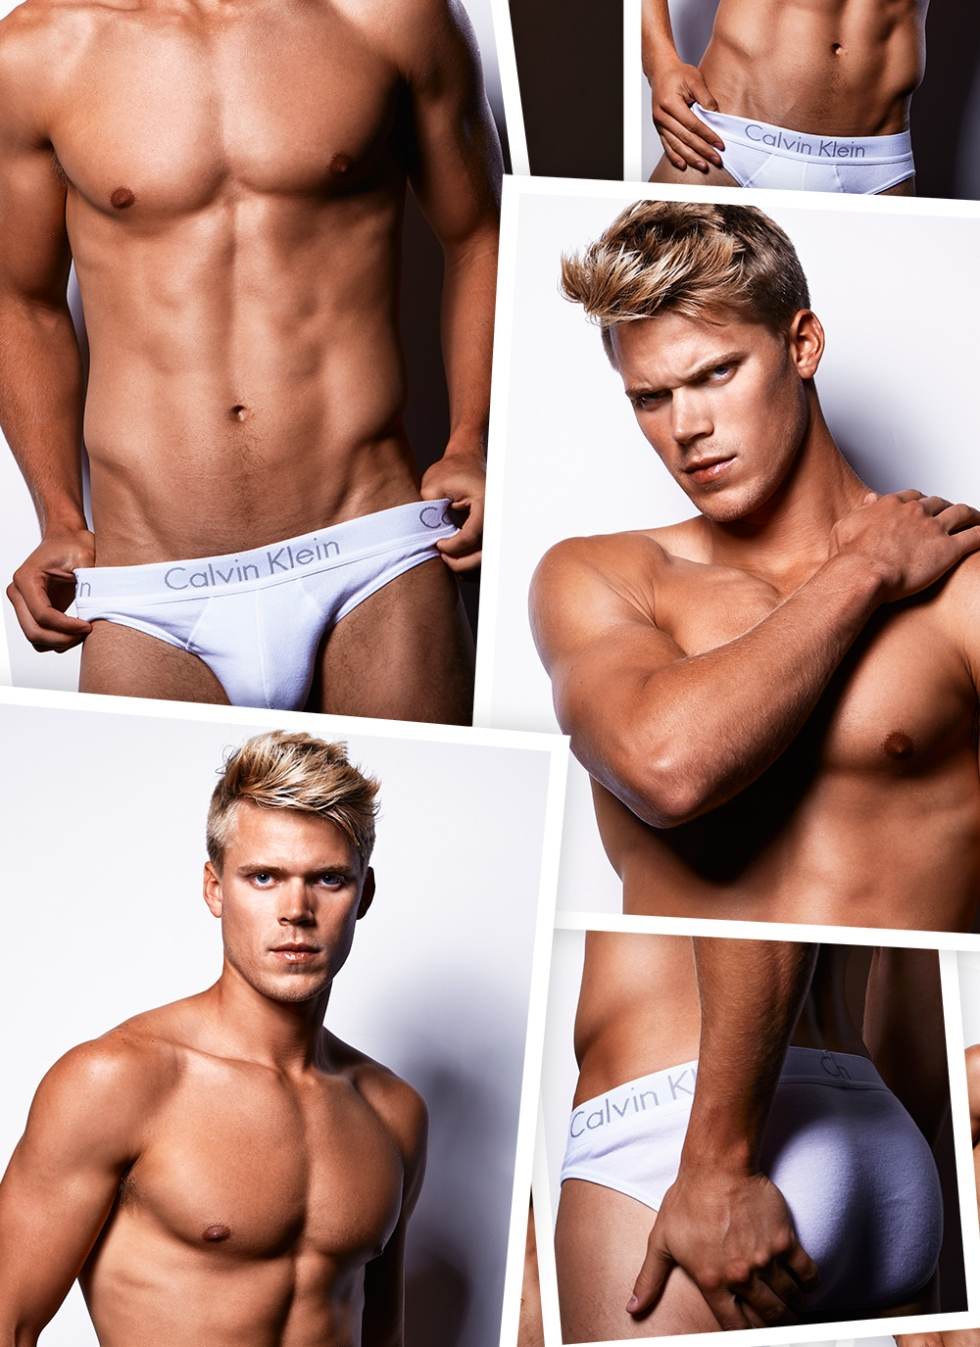 Featuring handsome newcomer model Jordan Hagel shots by Kiet Thai